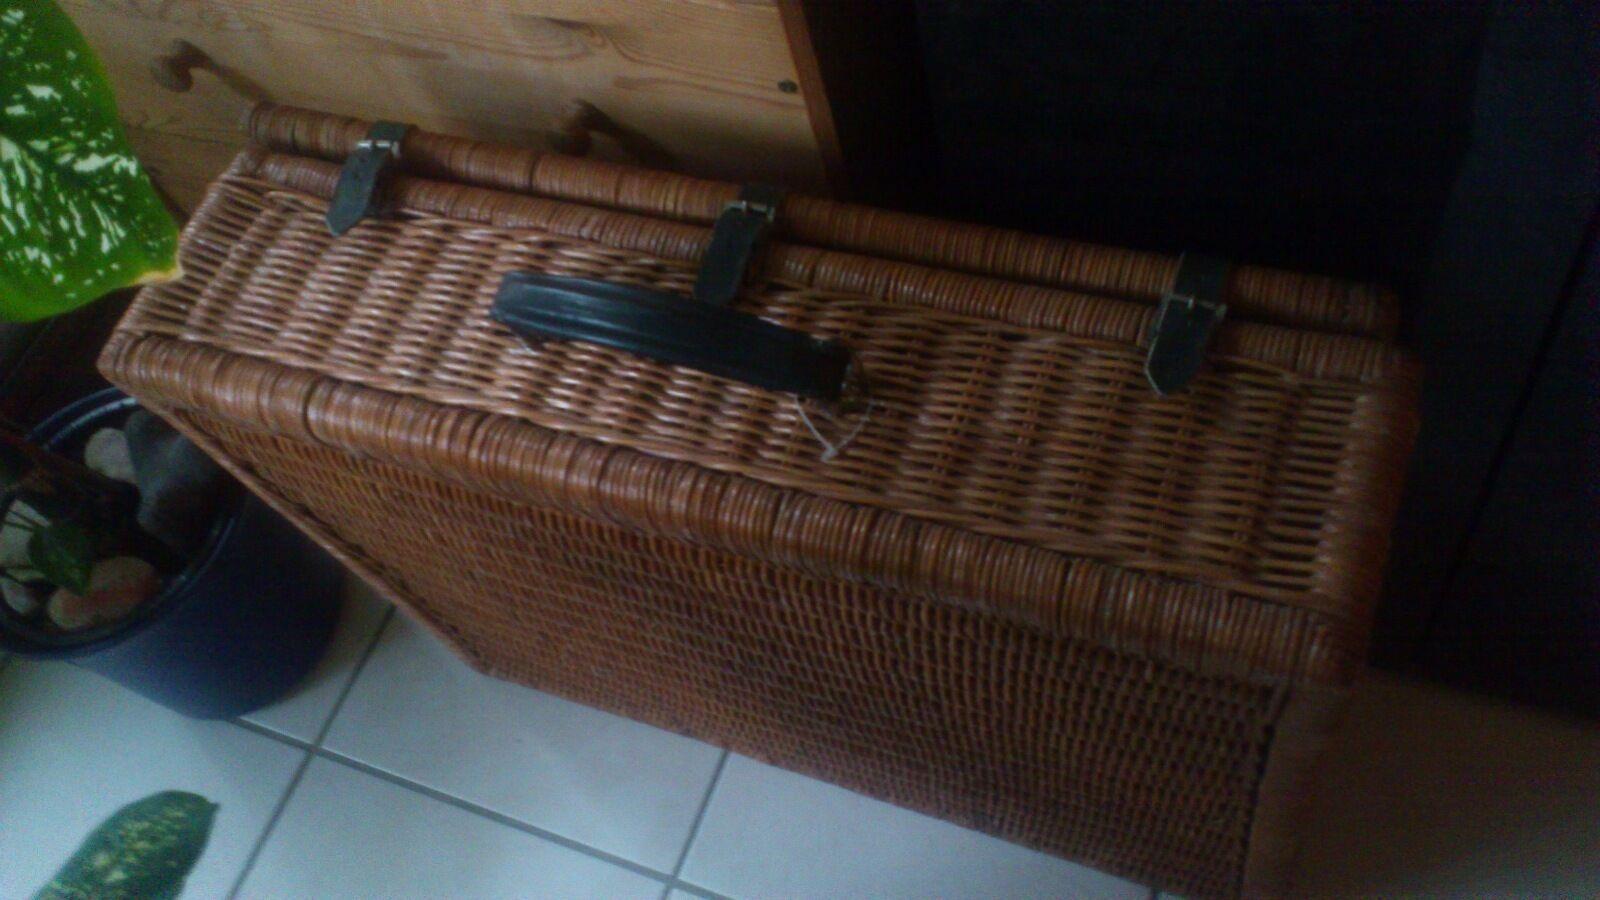 NEU  Picknickkorb Weidenkoffer Besteückt 4 Pers. Porzellan Glas Besteck Thermos